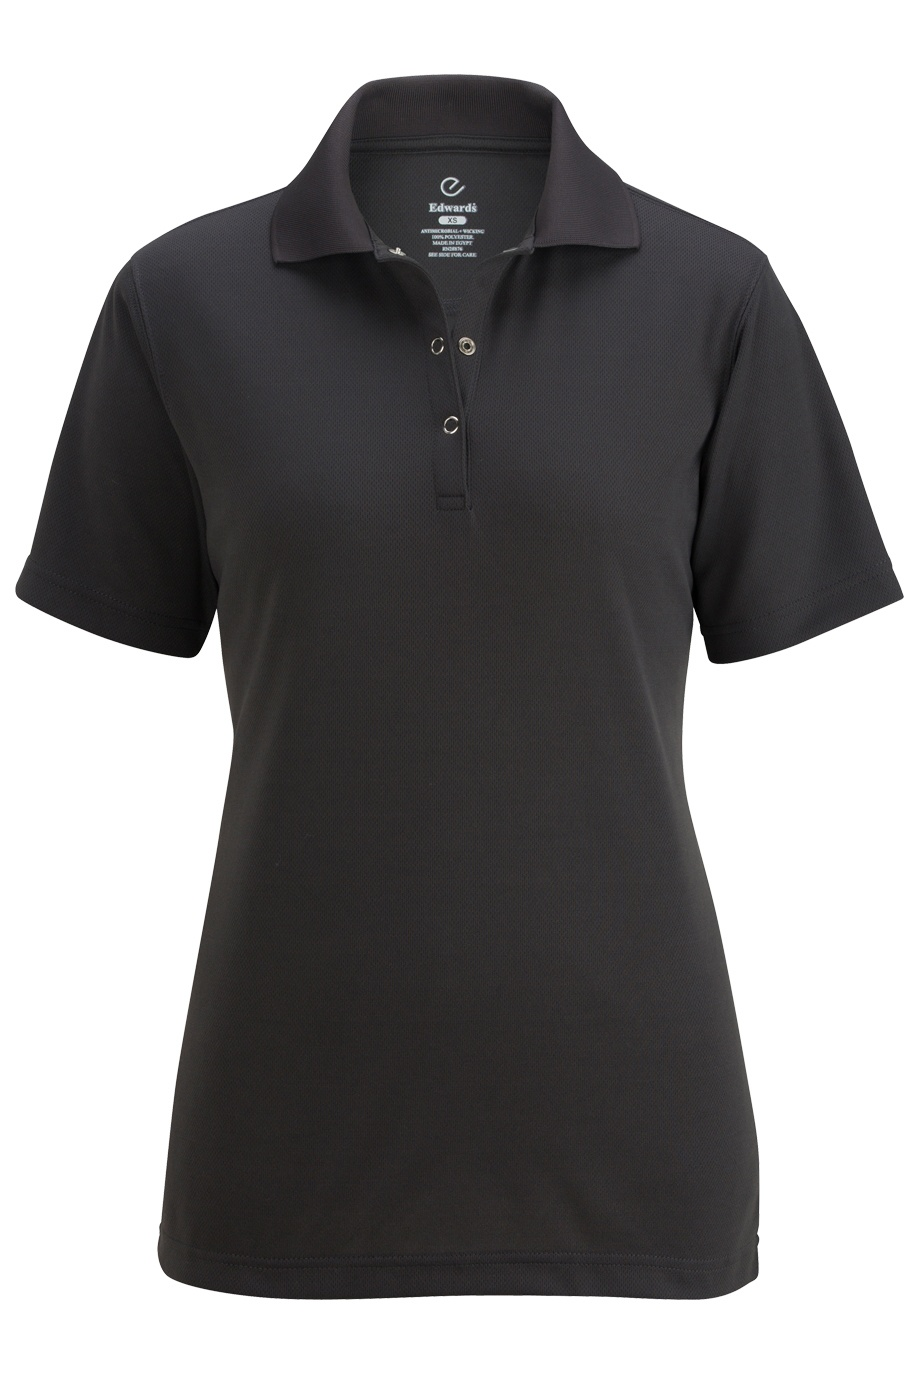 'Edwards 5586 Ladies' Snap Front Hi-Performance Short Sleeve Polo'